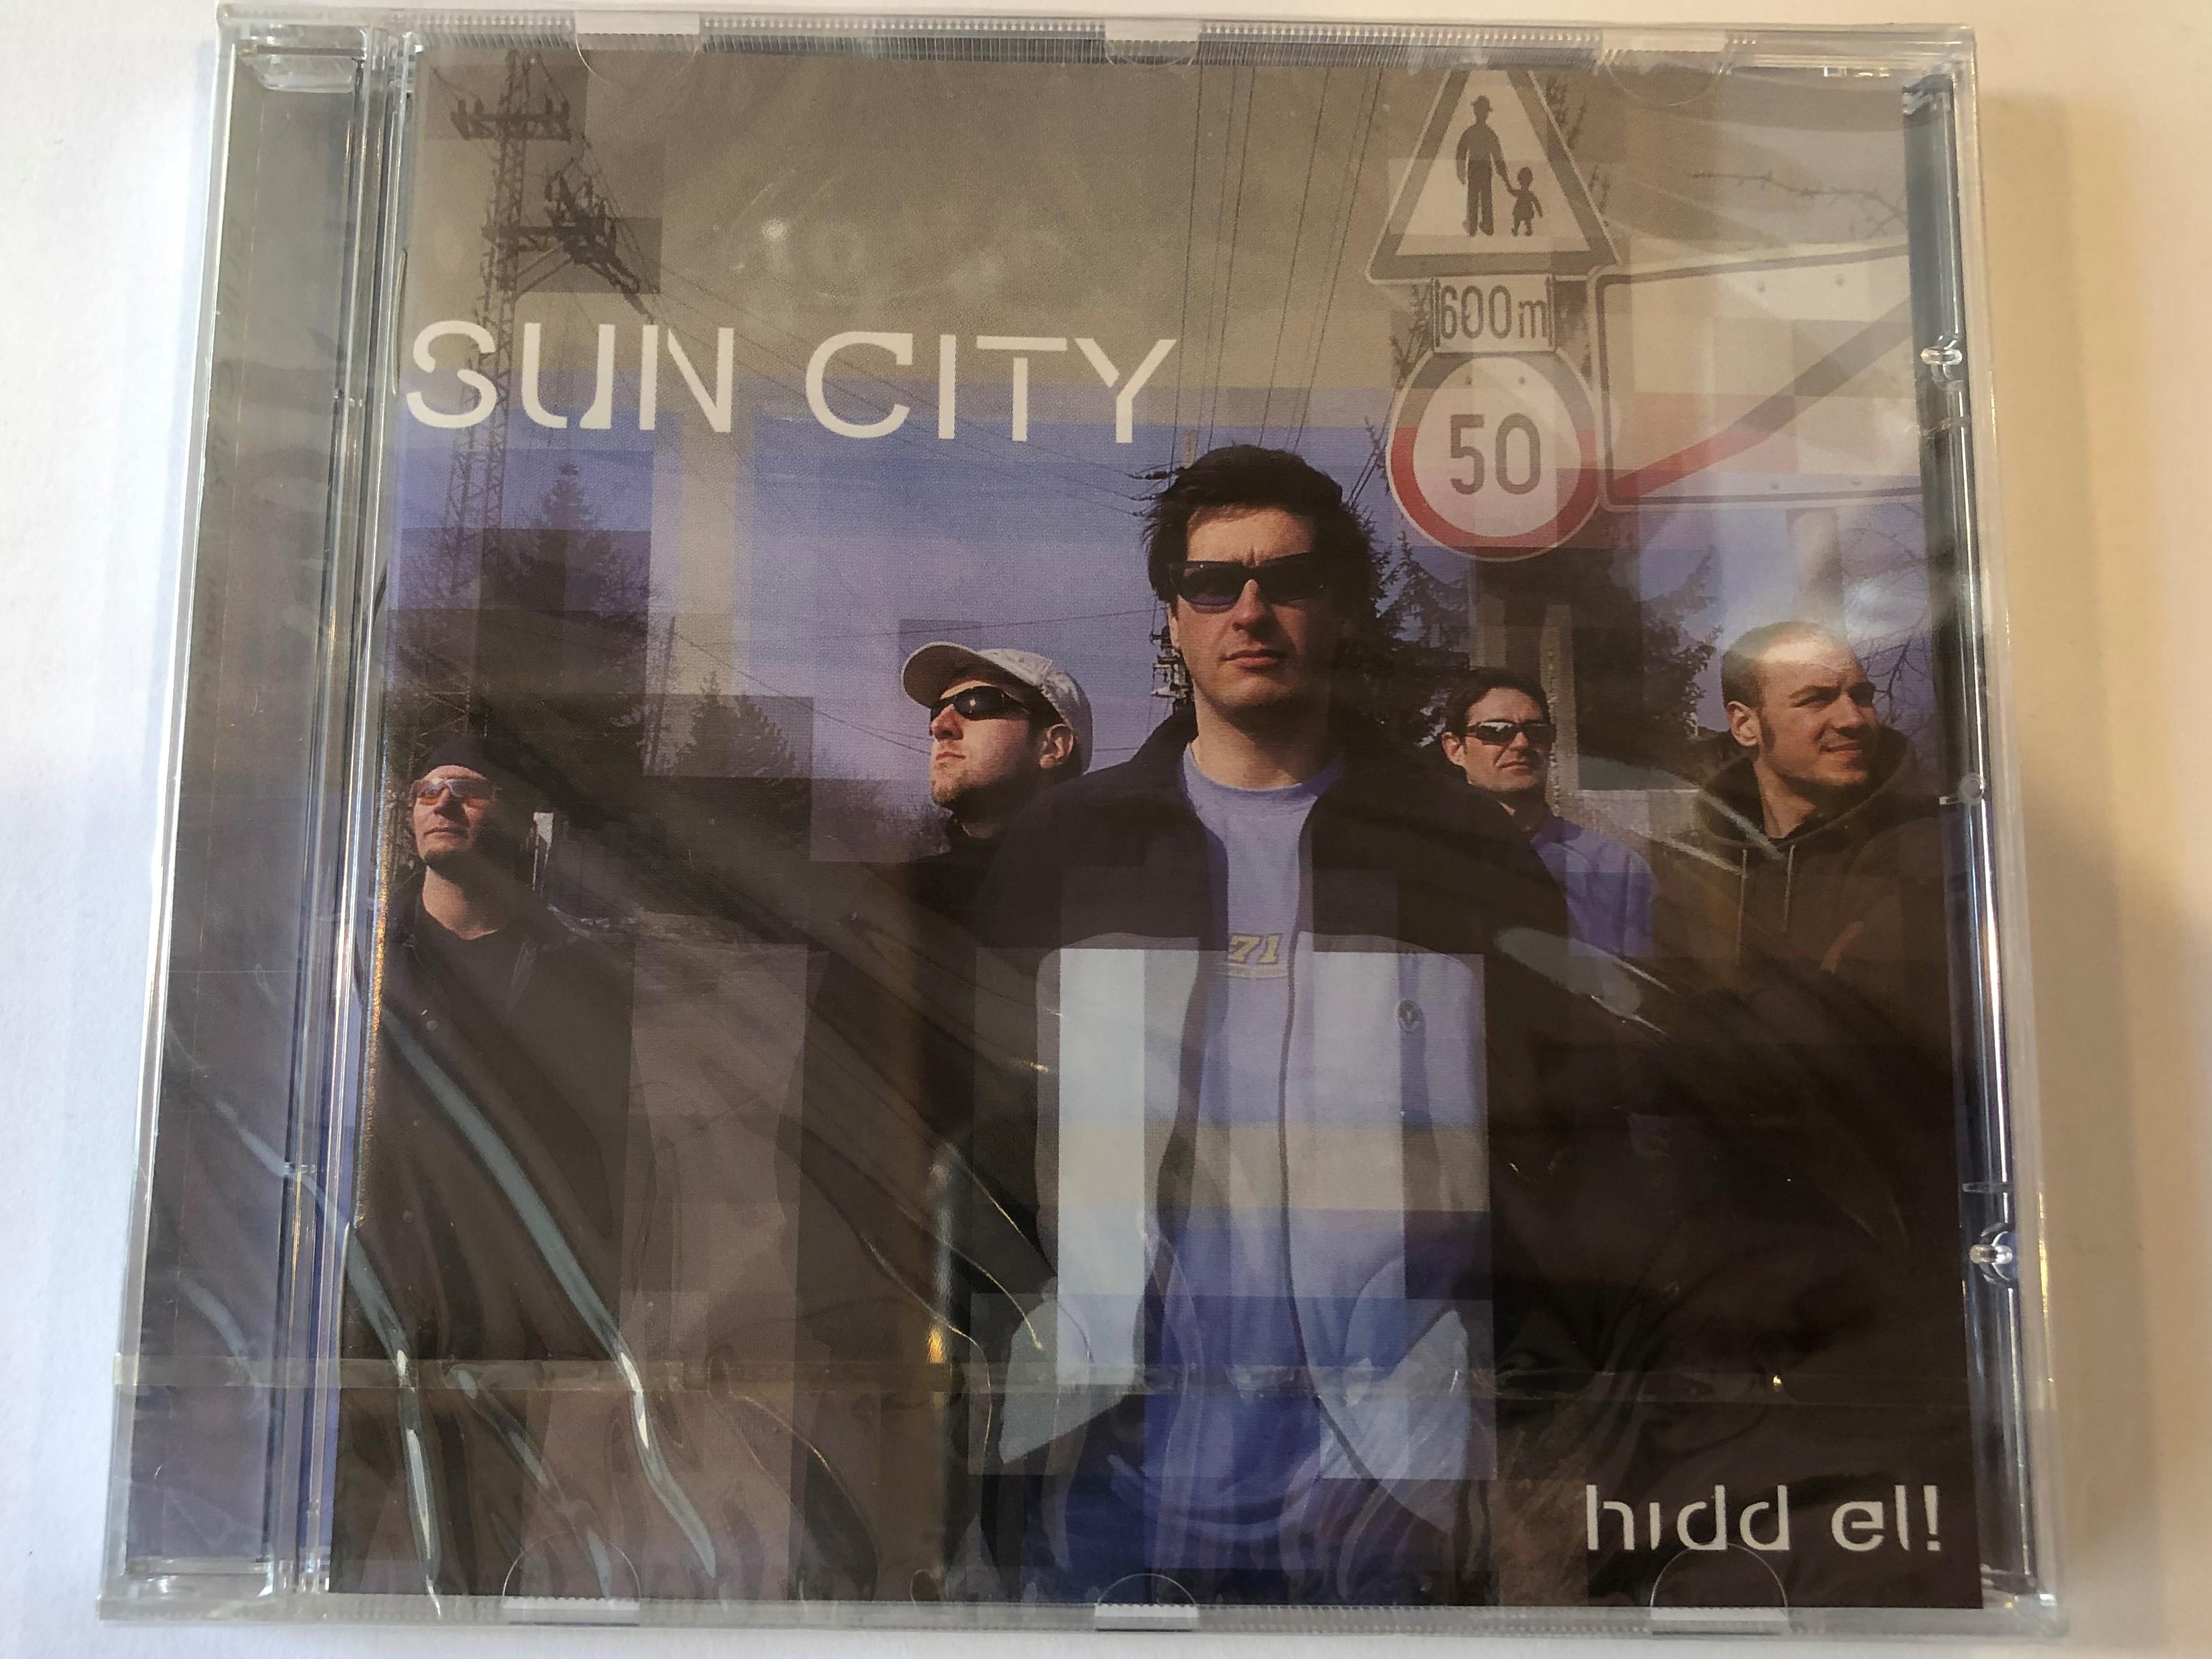 sun-city-hidd-el-ff-film-music-audio-cd-731406861123-1-.jpg